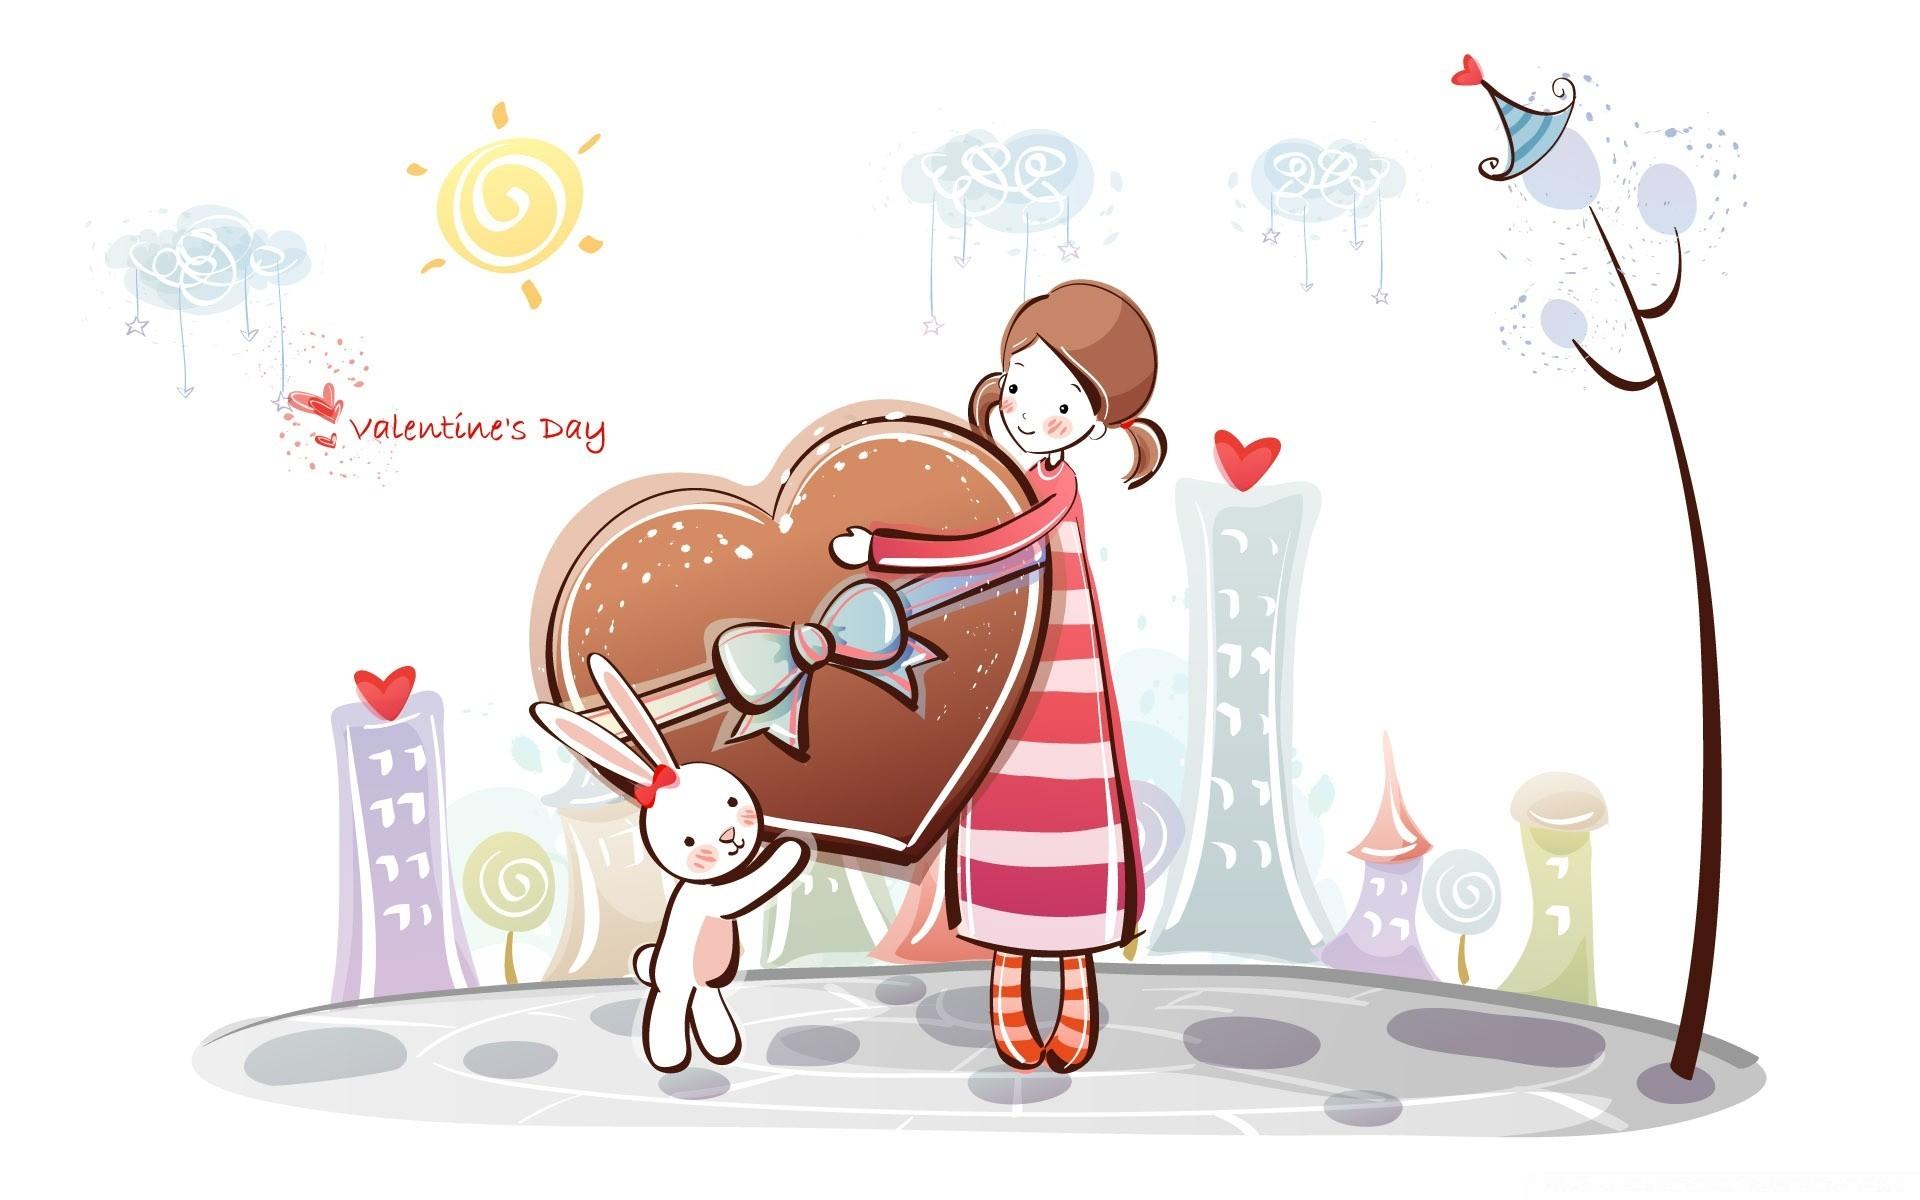 День святого валентина картинки маме